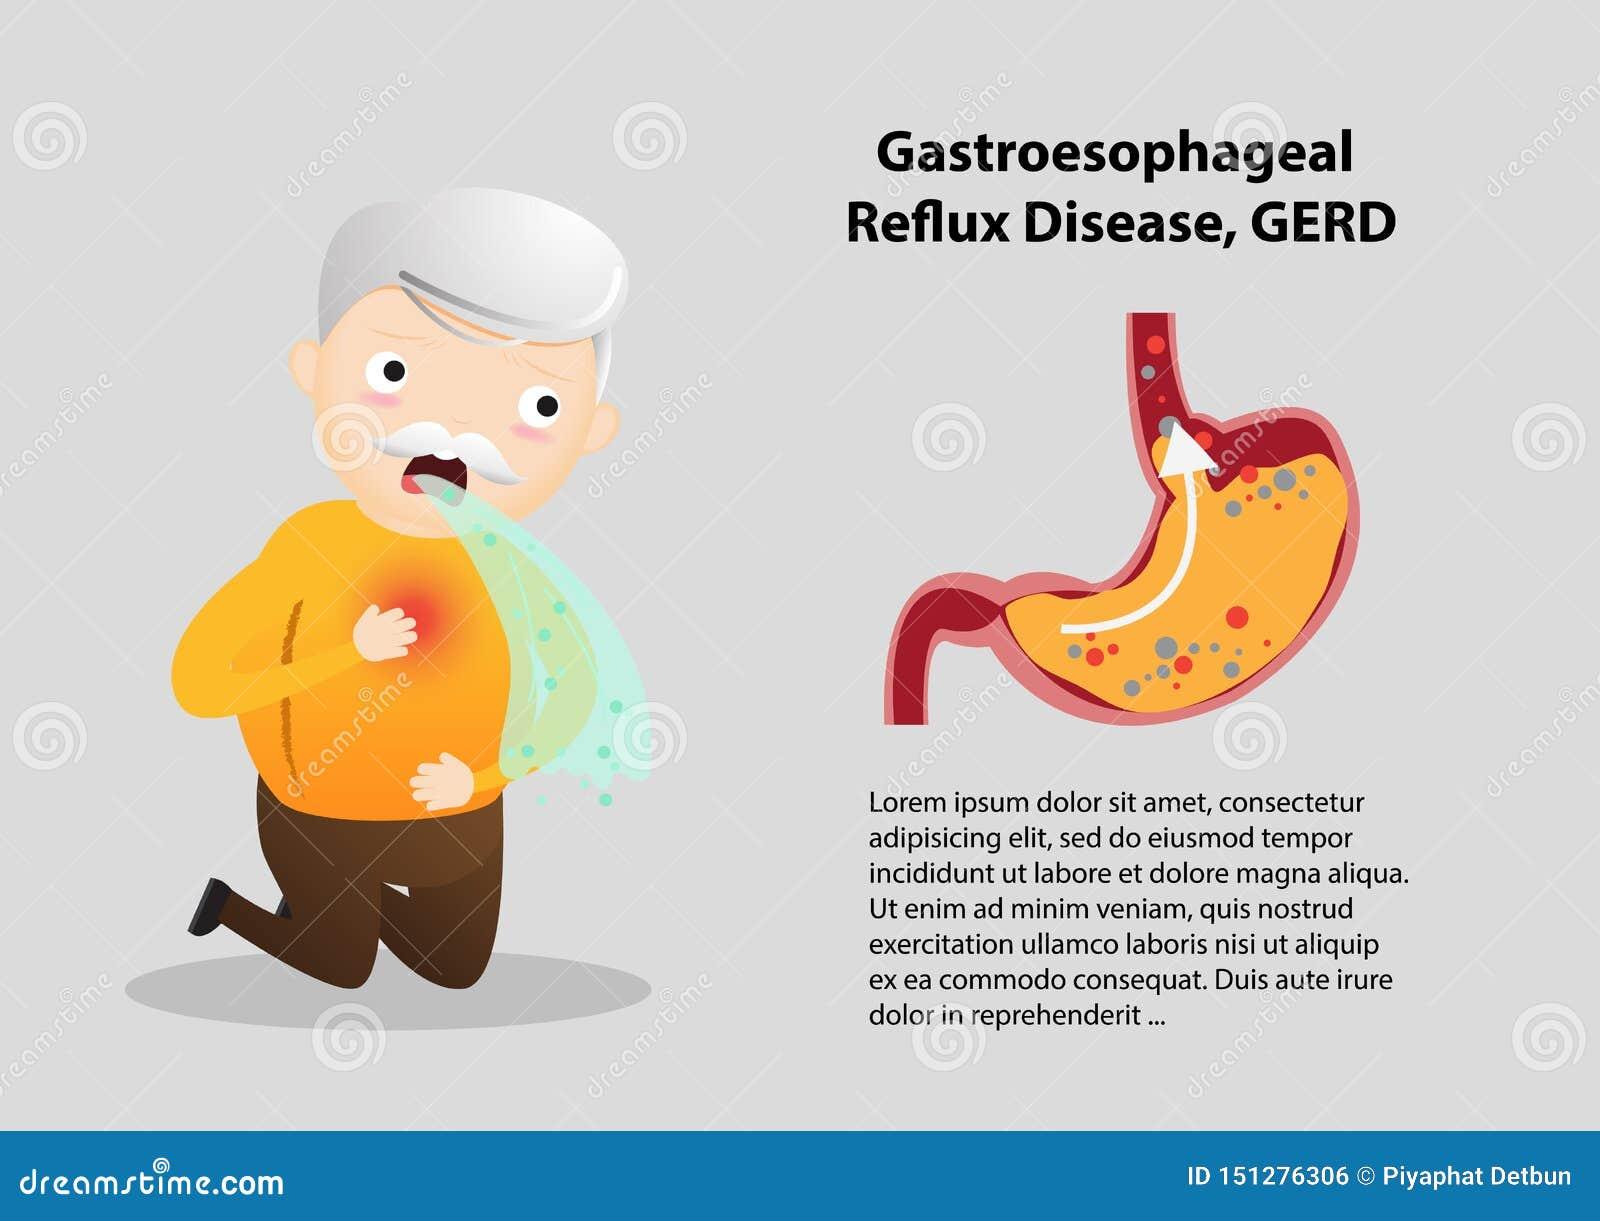 Gastro-Esophageal Reflux Disease GERD